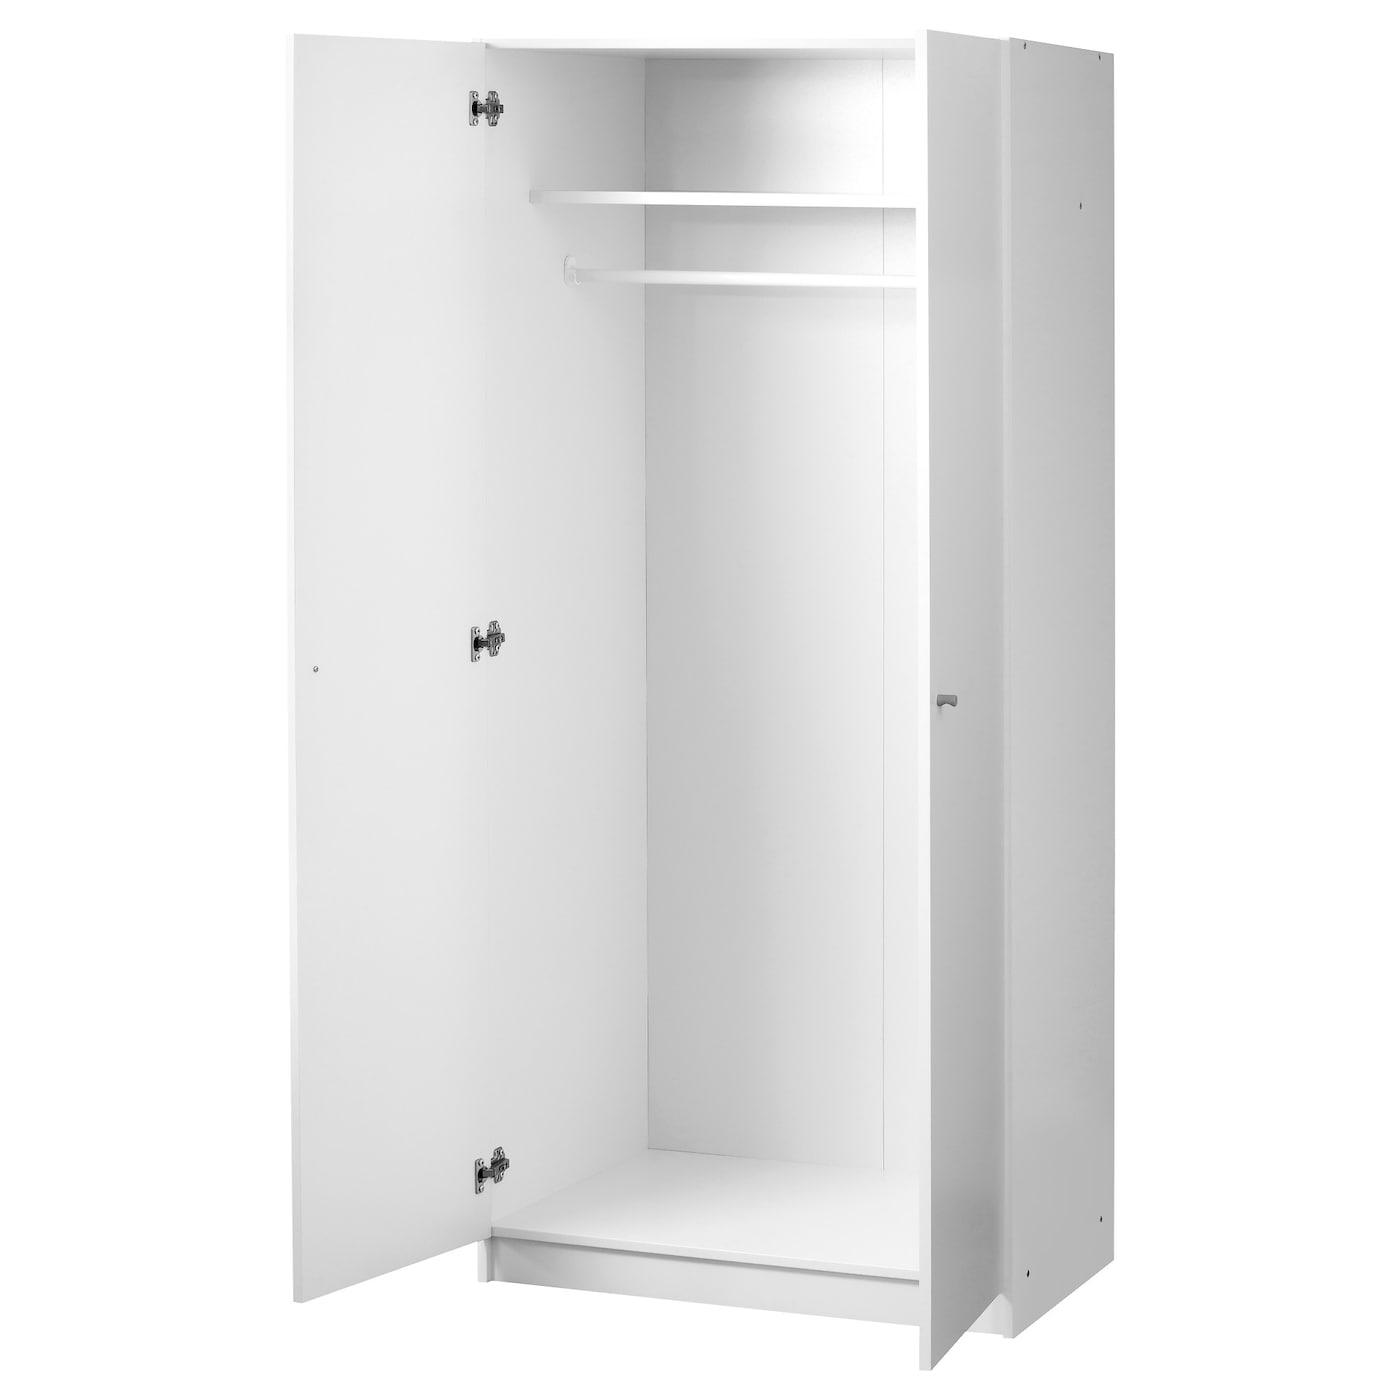 Bostrak Wardrobe White 80 X 50 X 180 Cm Ikea